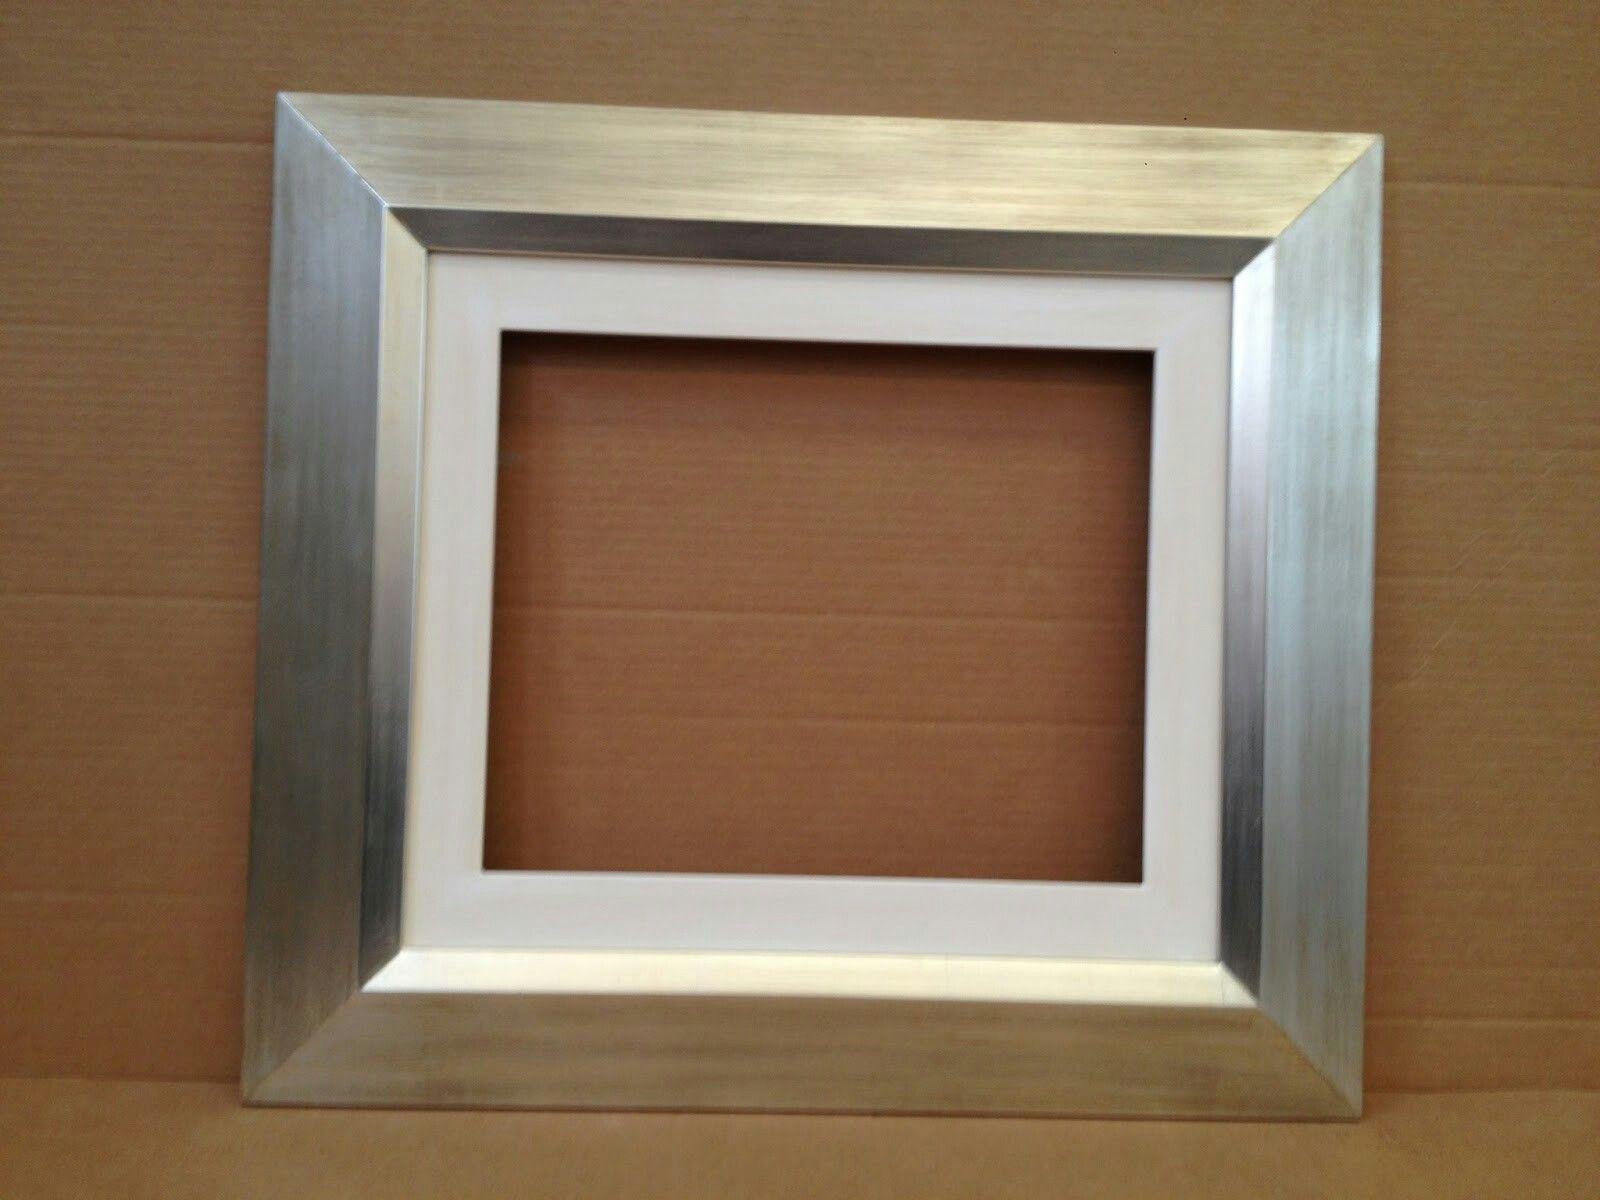 Marco para cuadro madera pinterest marcos para for Marcos para espejos grandes modernos